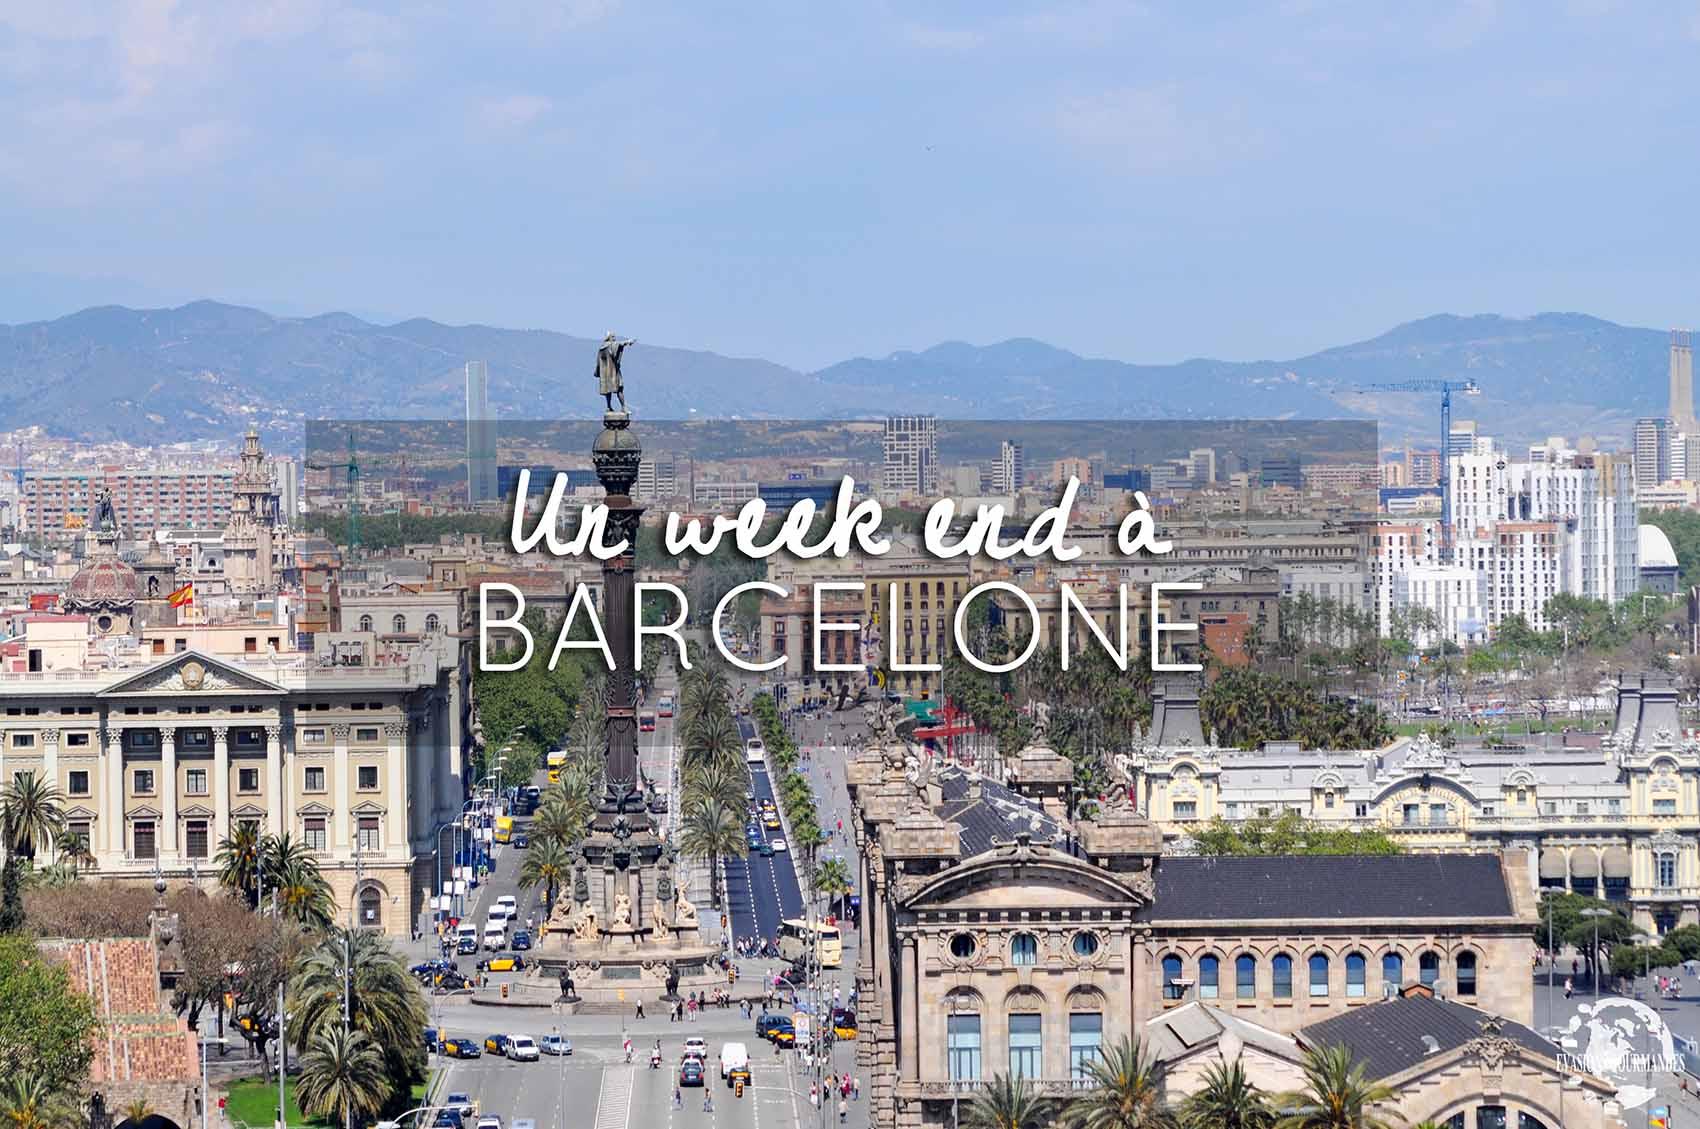 Weel end à Barcelone